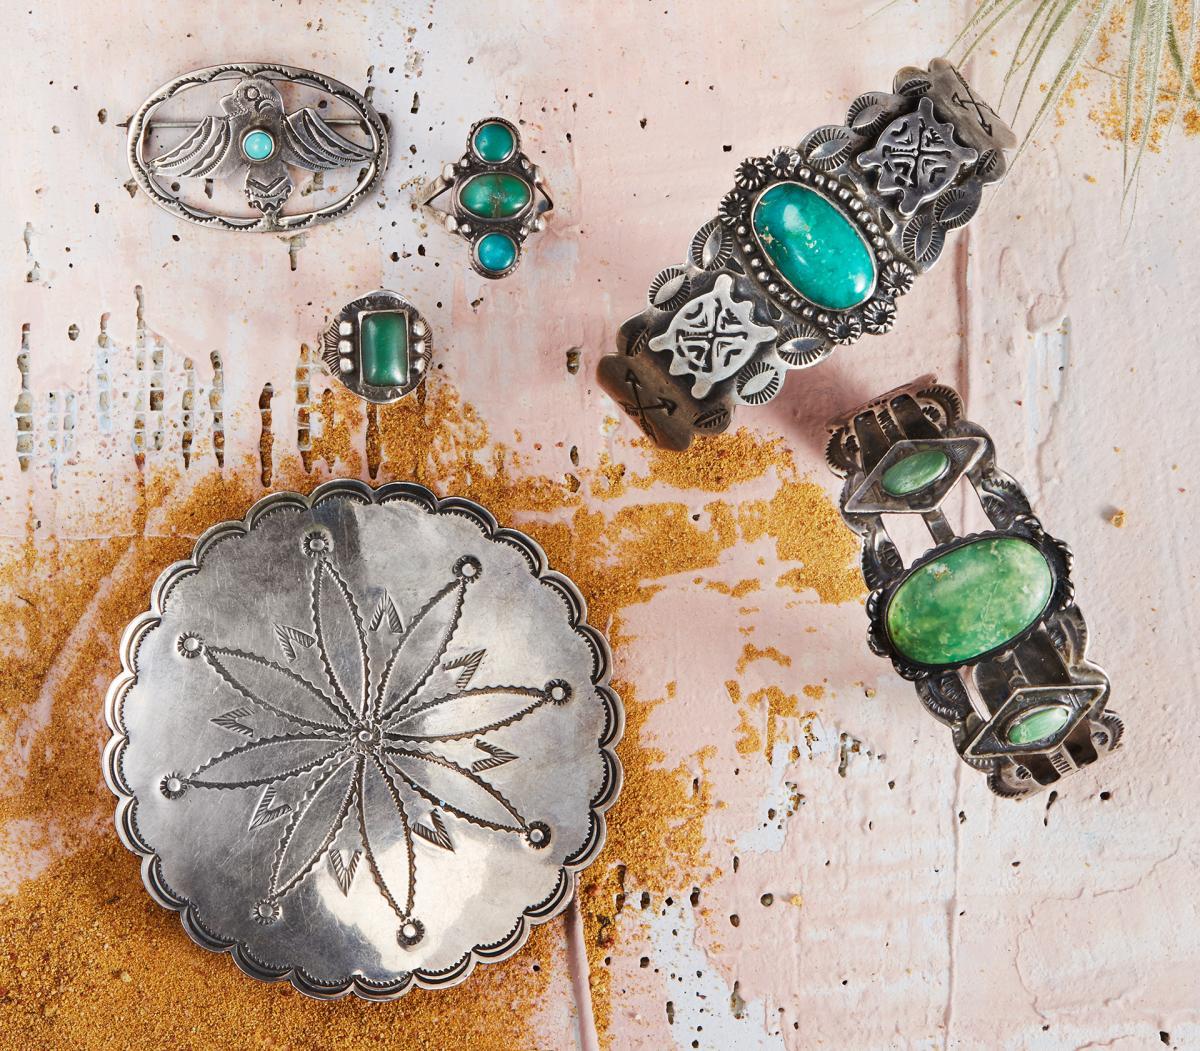 Vintage bird pin with turquoise, Vintage Navajo pinkie ring, Vintage three-stone turquoise ring, Vintage crossed arrows cuff, Vintage Navajo stamped dish, Vintage Cerrillos cuff